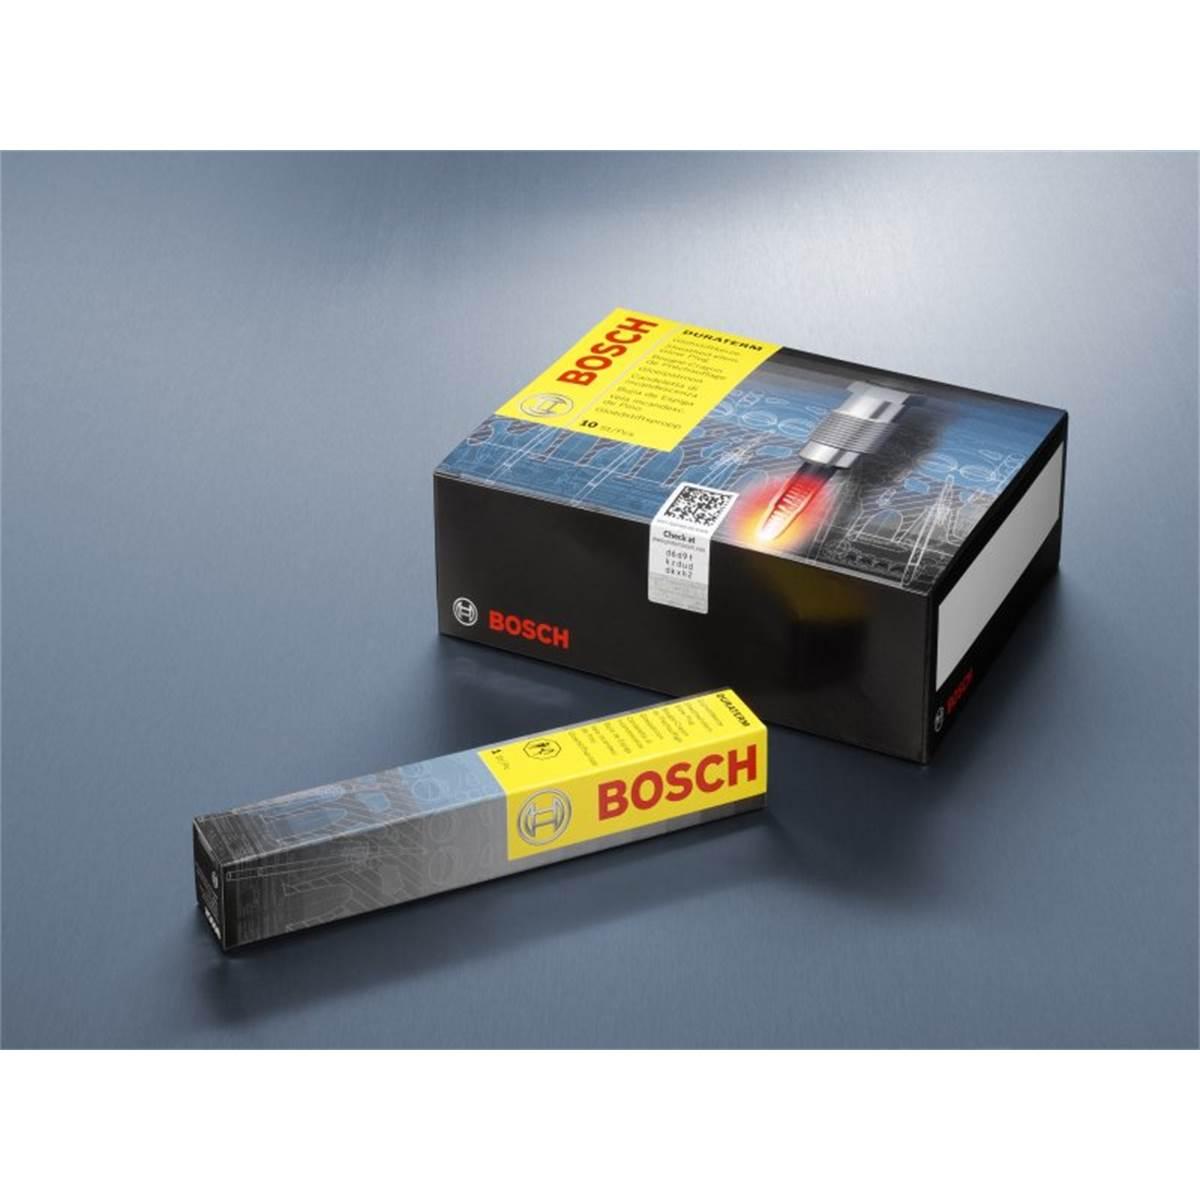 Bougie de préchauffage Bosch N°1027